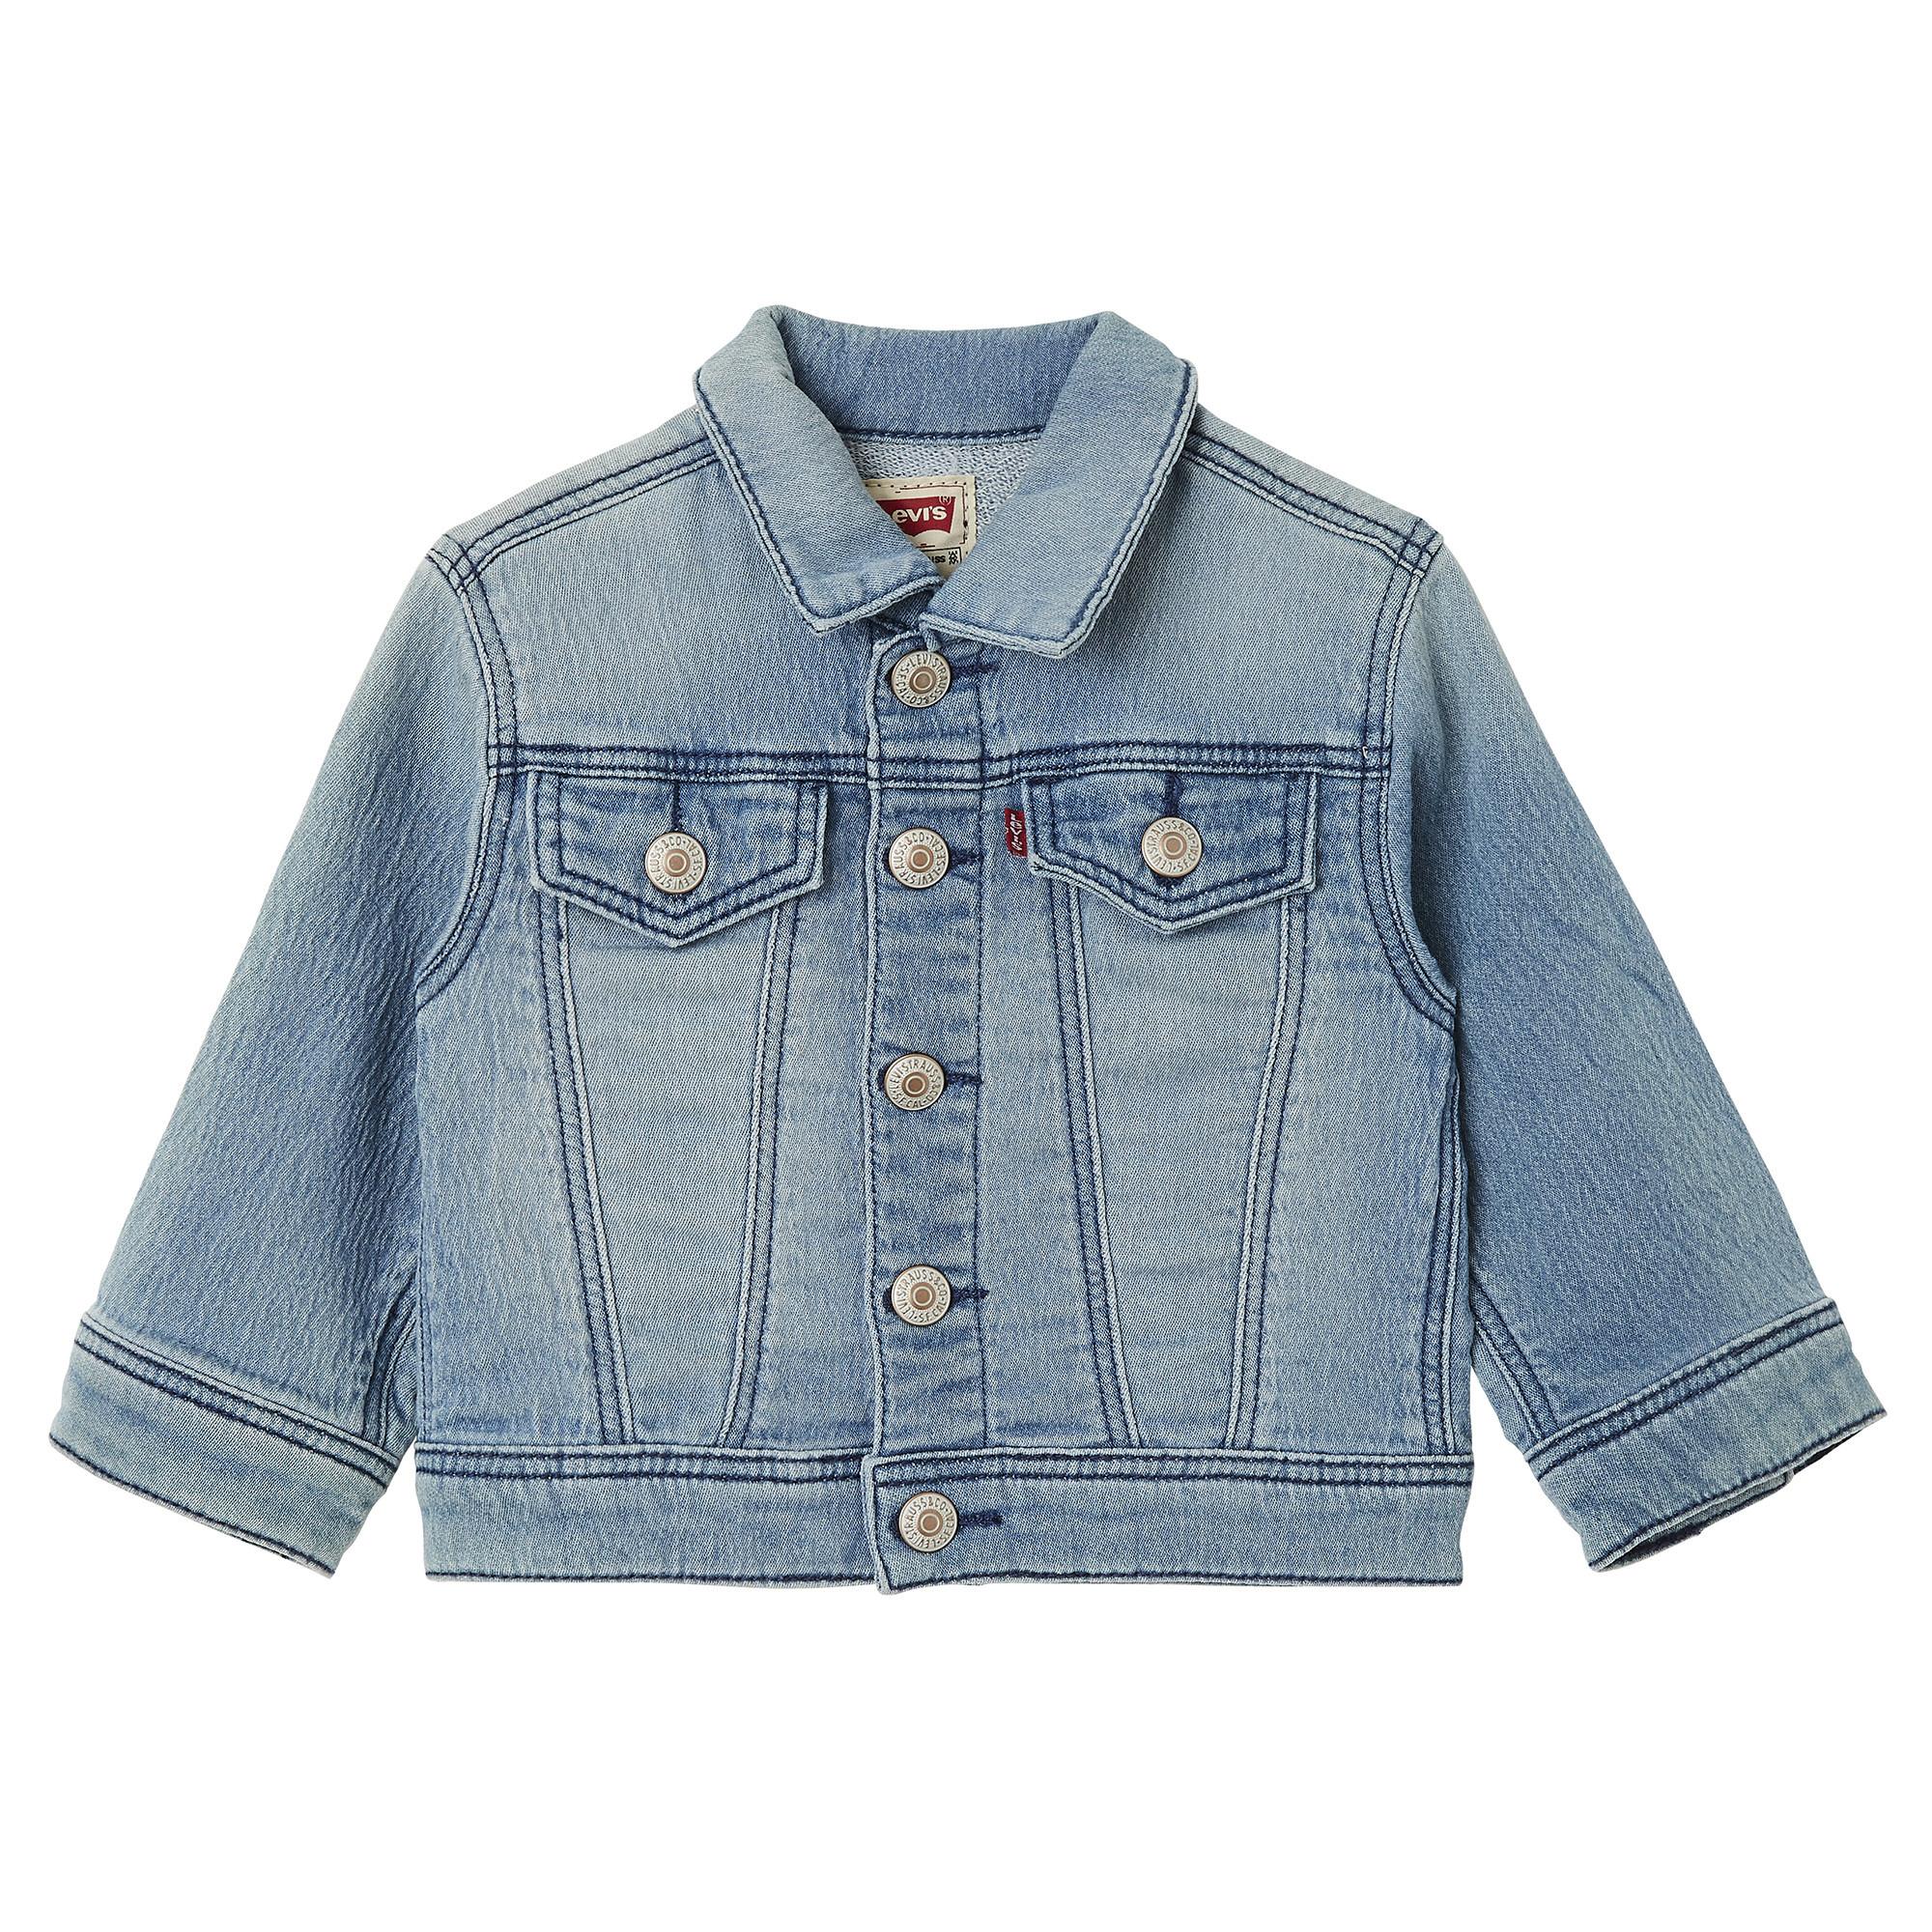 Levi's Jacket Clea Indigo